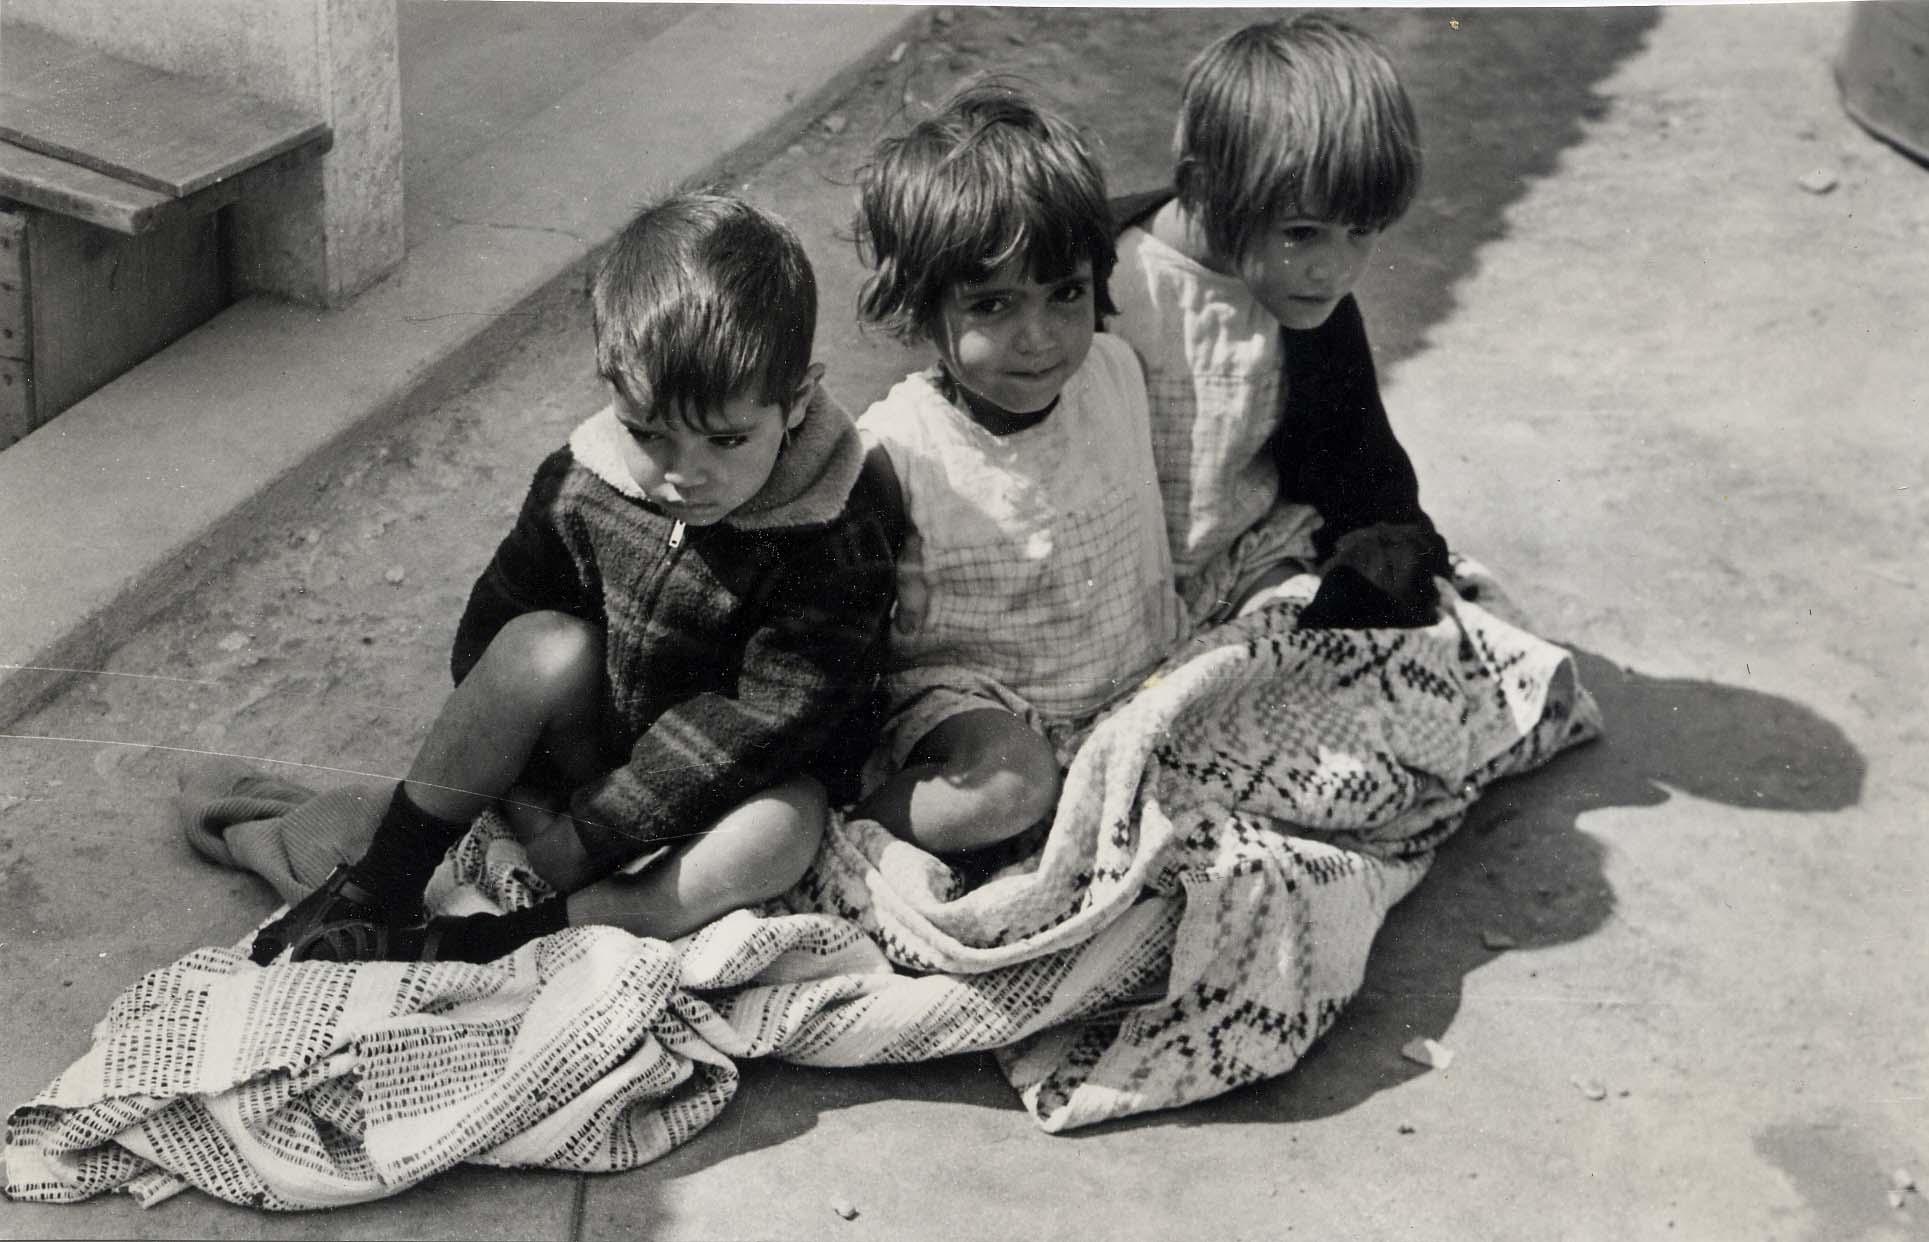 Bambini in una favela brasiliana